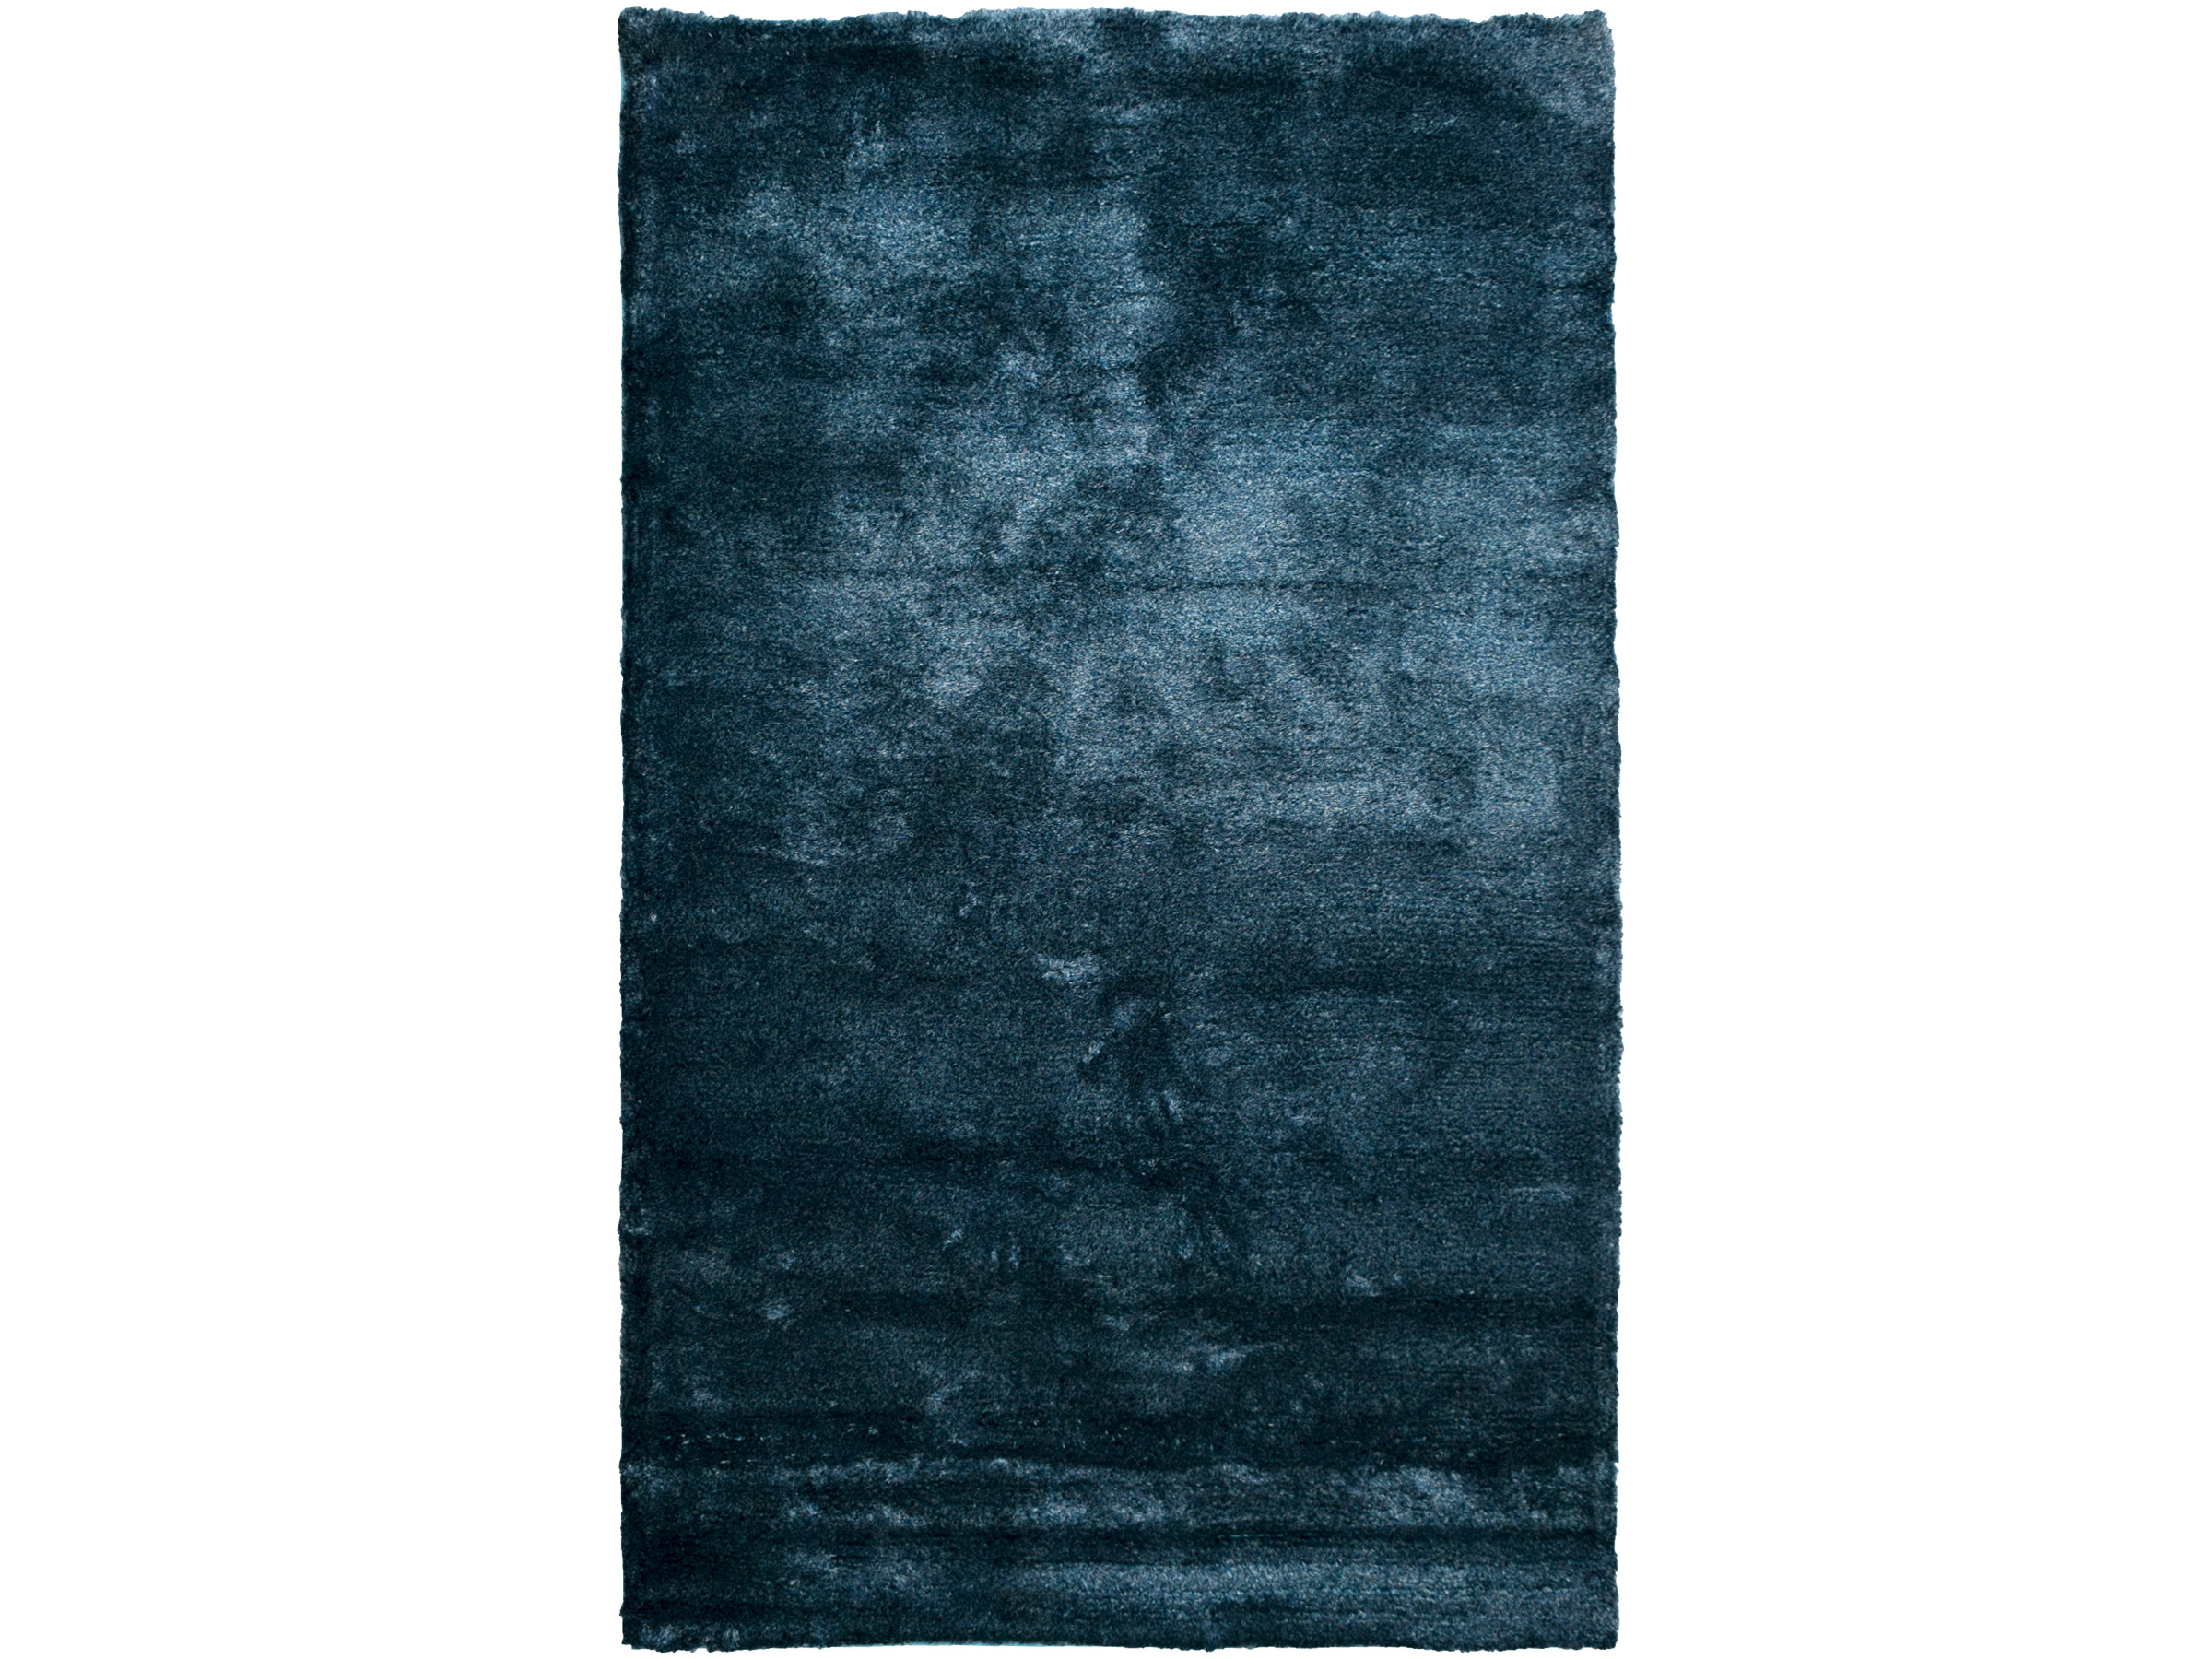 Tapijt Petrol Blauw : Oosters tapijt blauw gl u aboriginaltourismontario